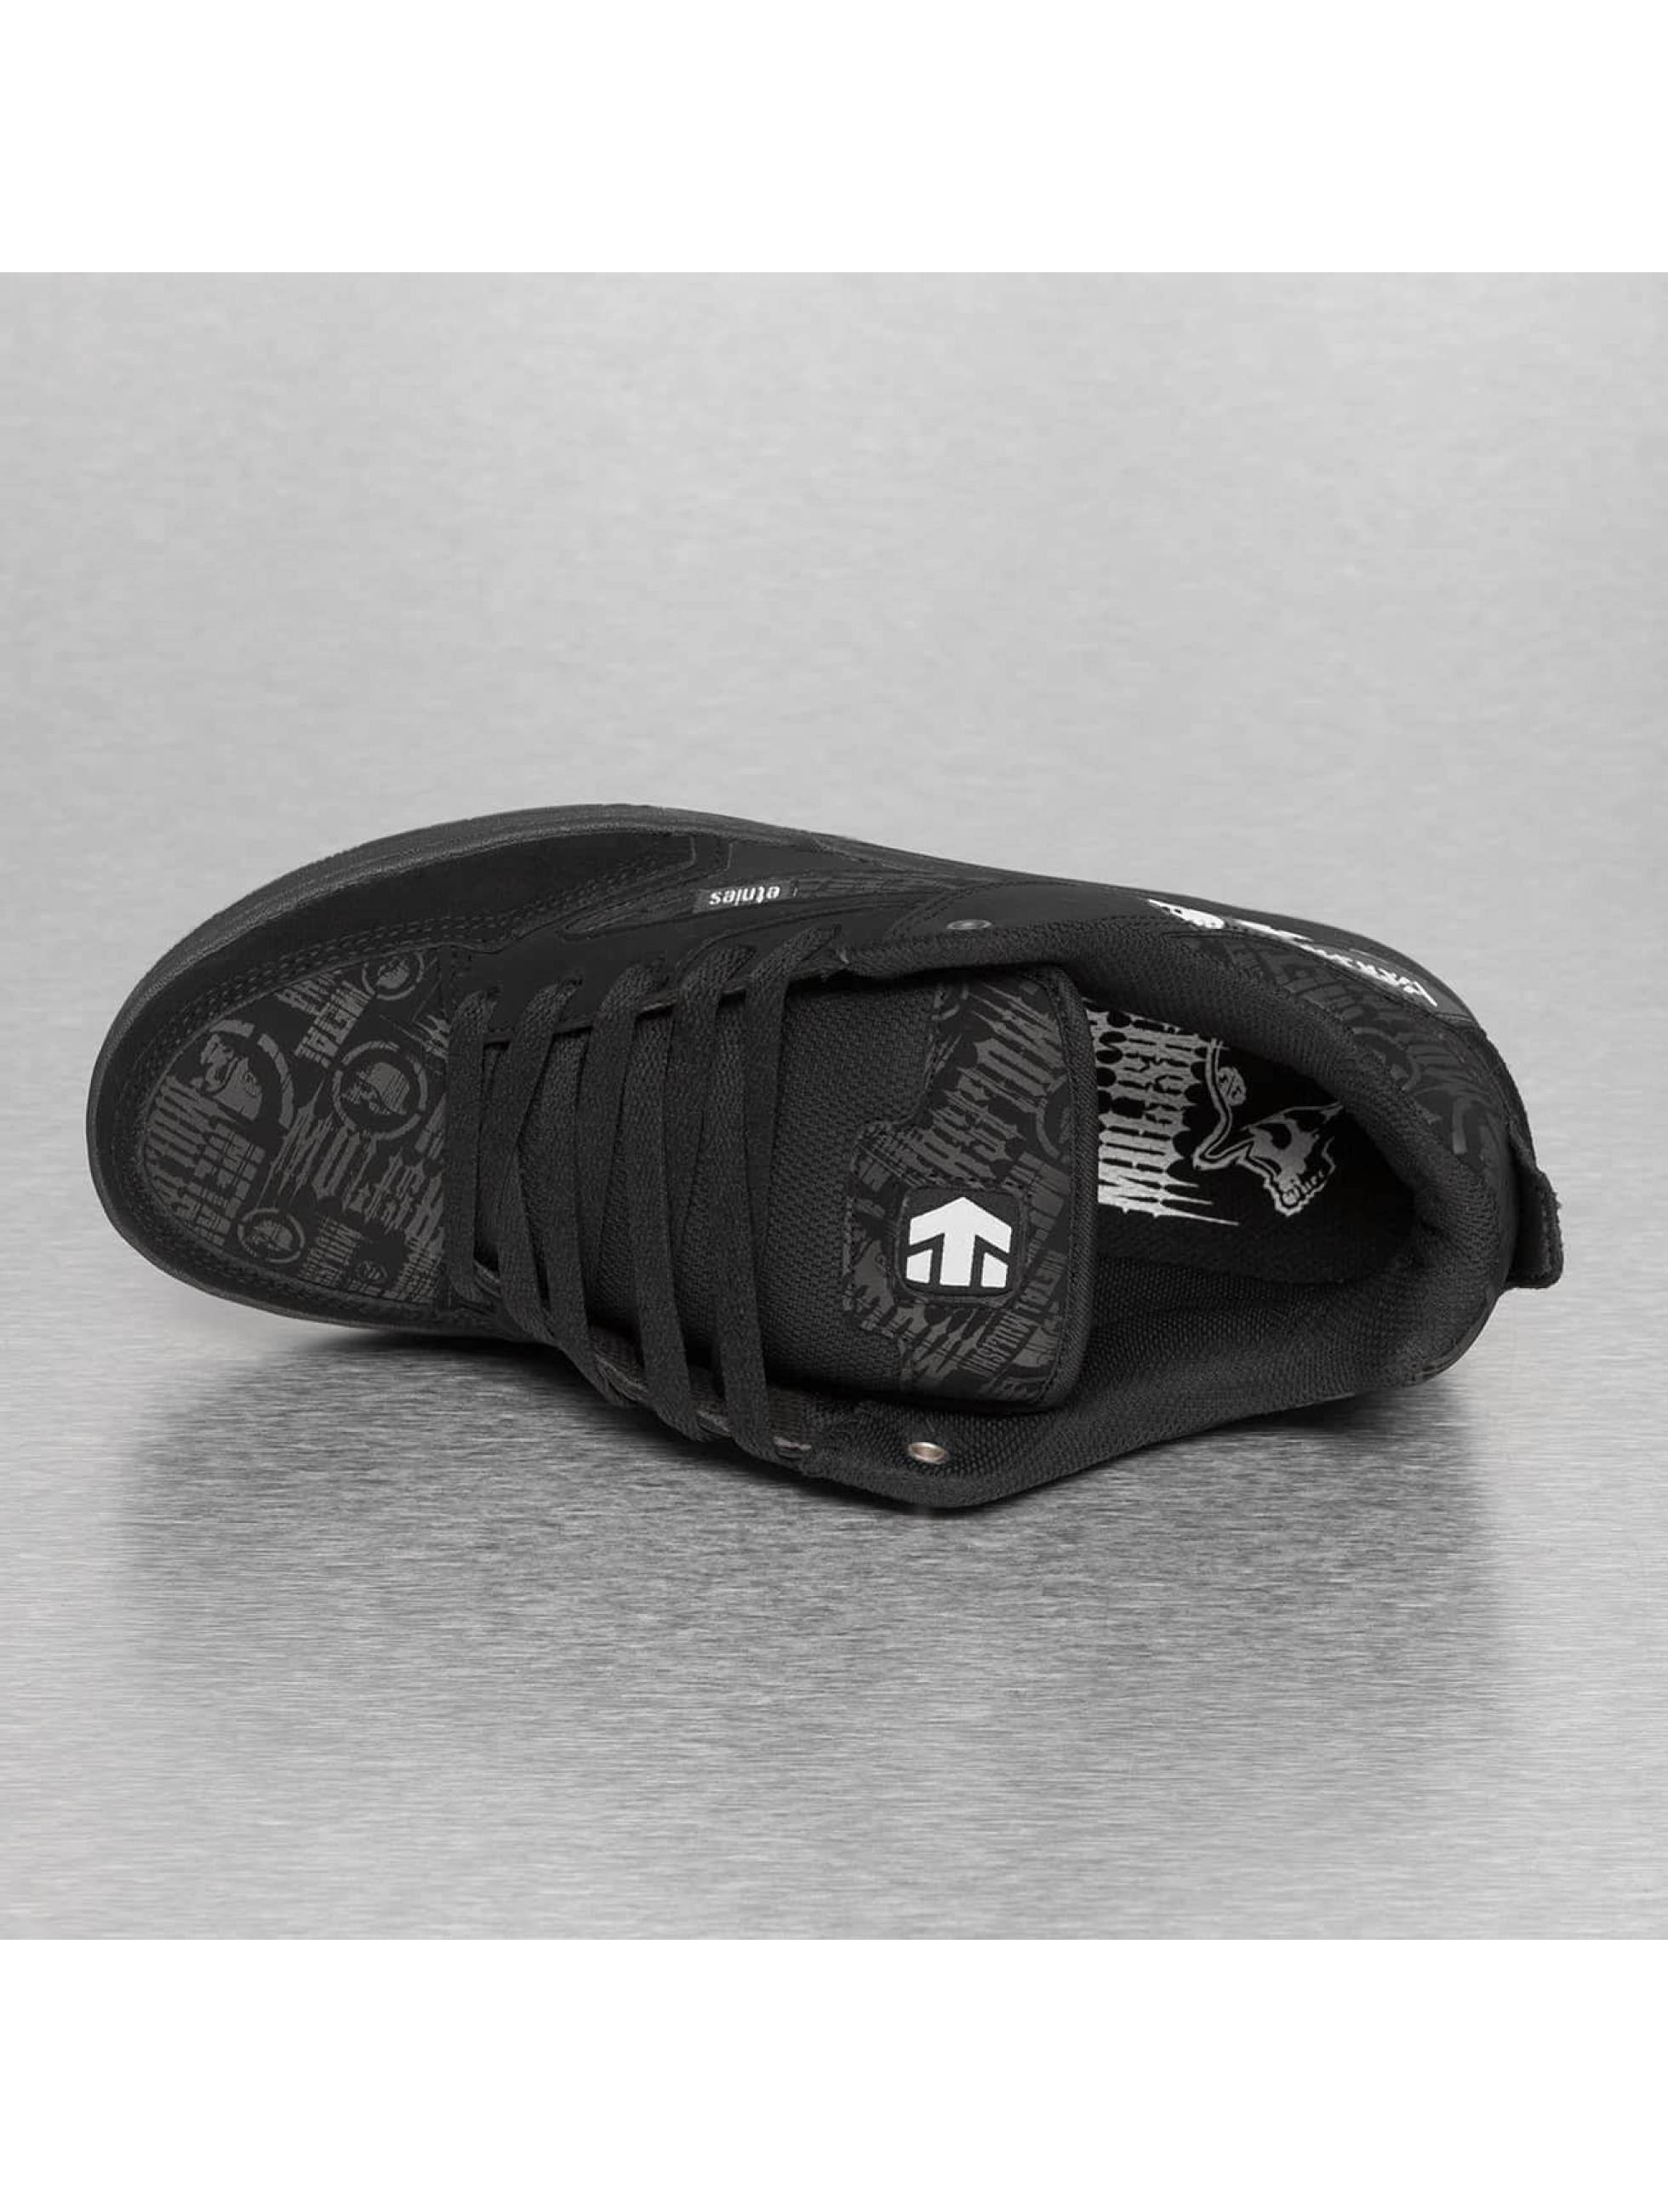 Etnies Sneakers Metal Mulisha Cartel sihay